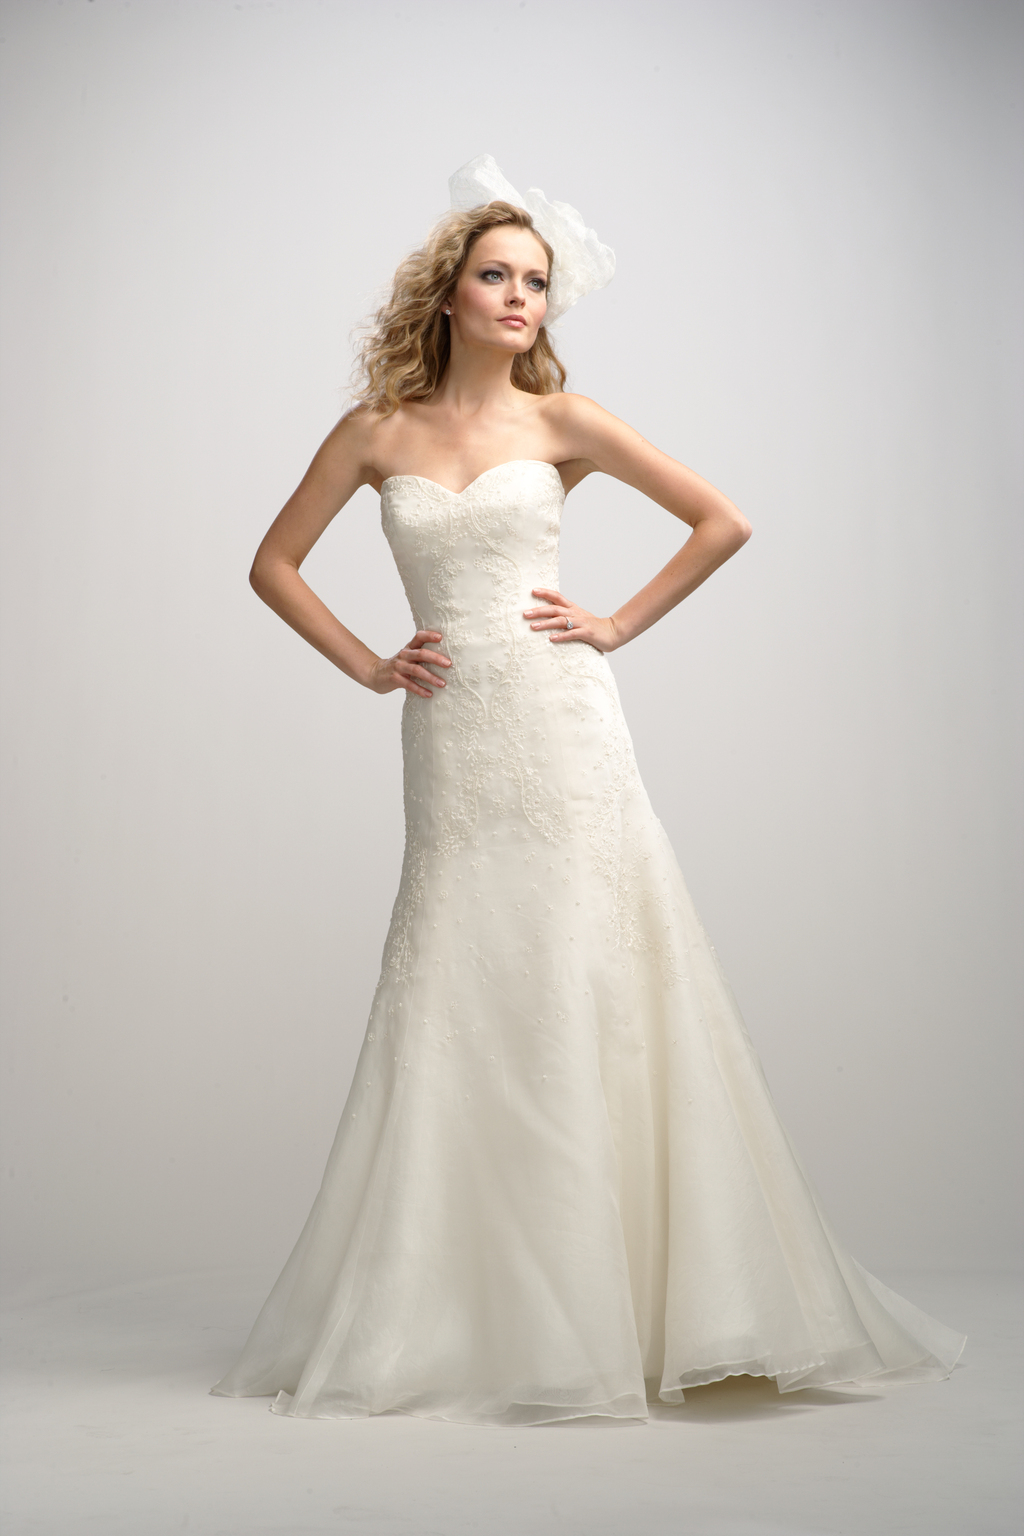 Fall-2012-wedding-dress-watters-bridal-gown-11.original.full